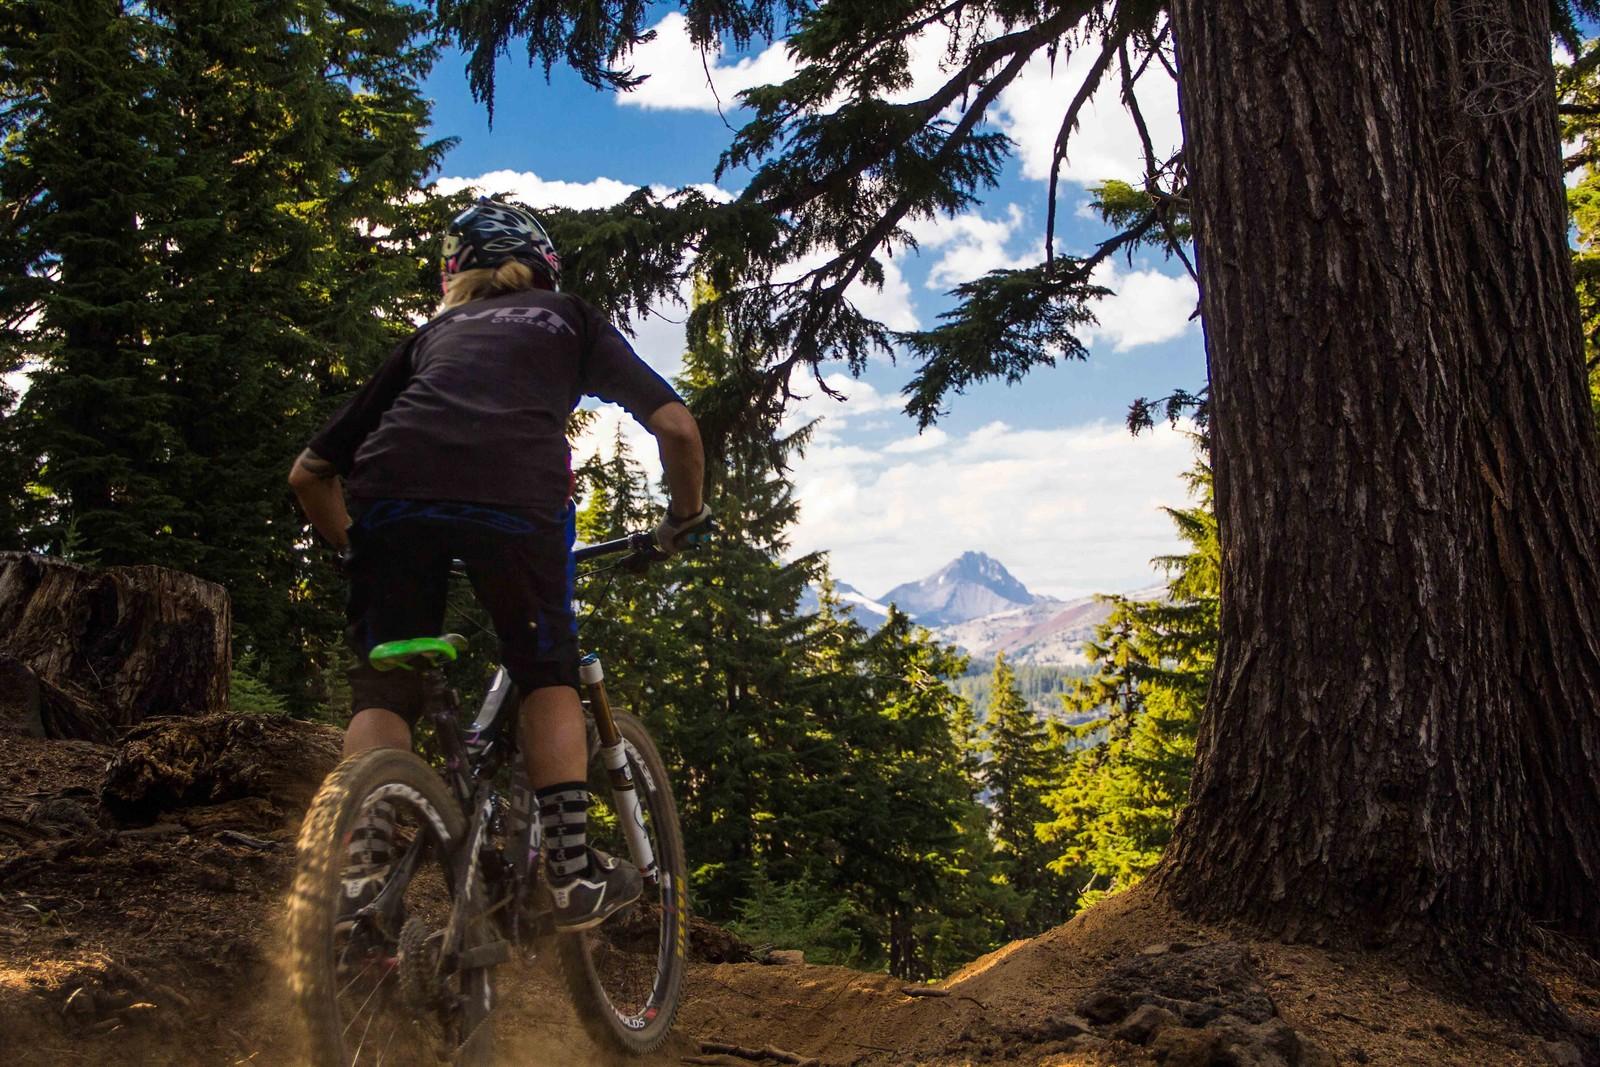 CRomaine2 - Yuroshek - Mountain Biking Pictures - Vital MTB